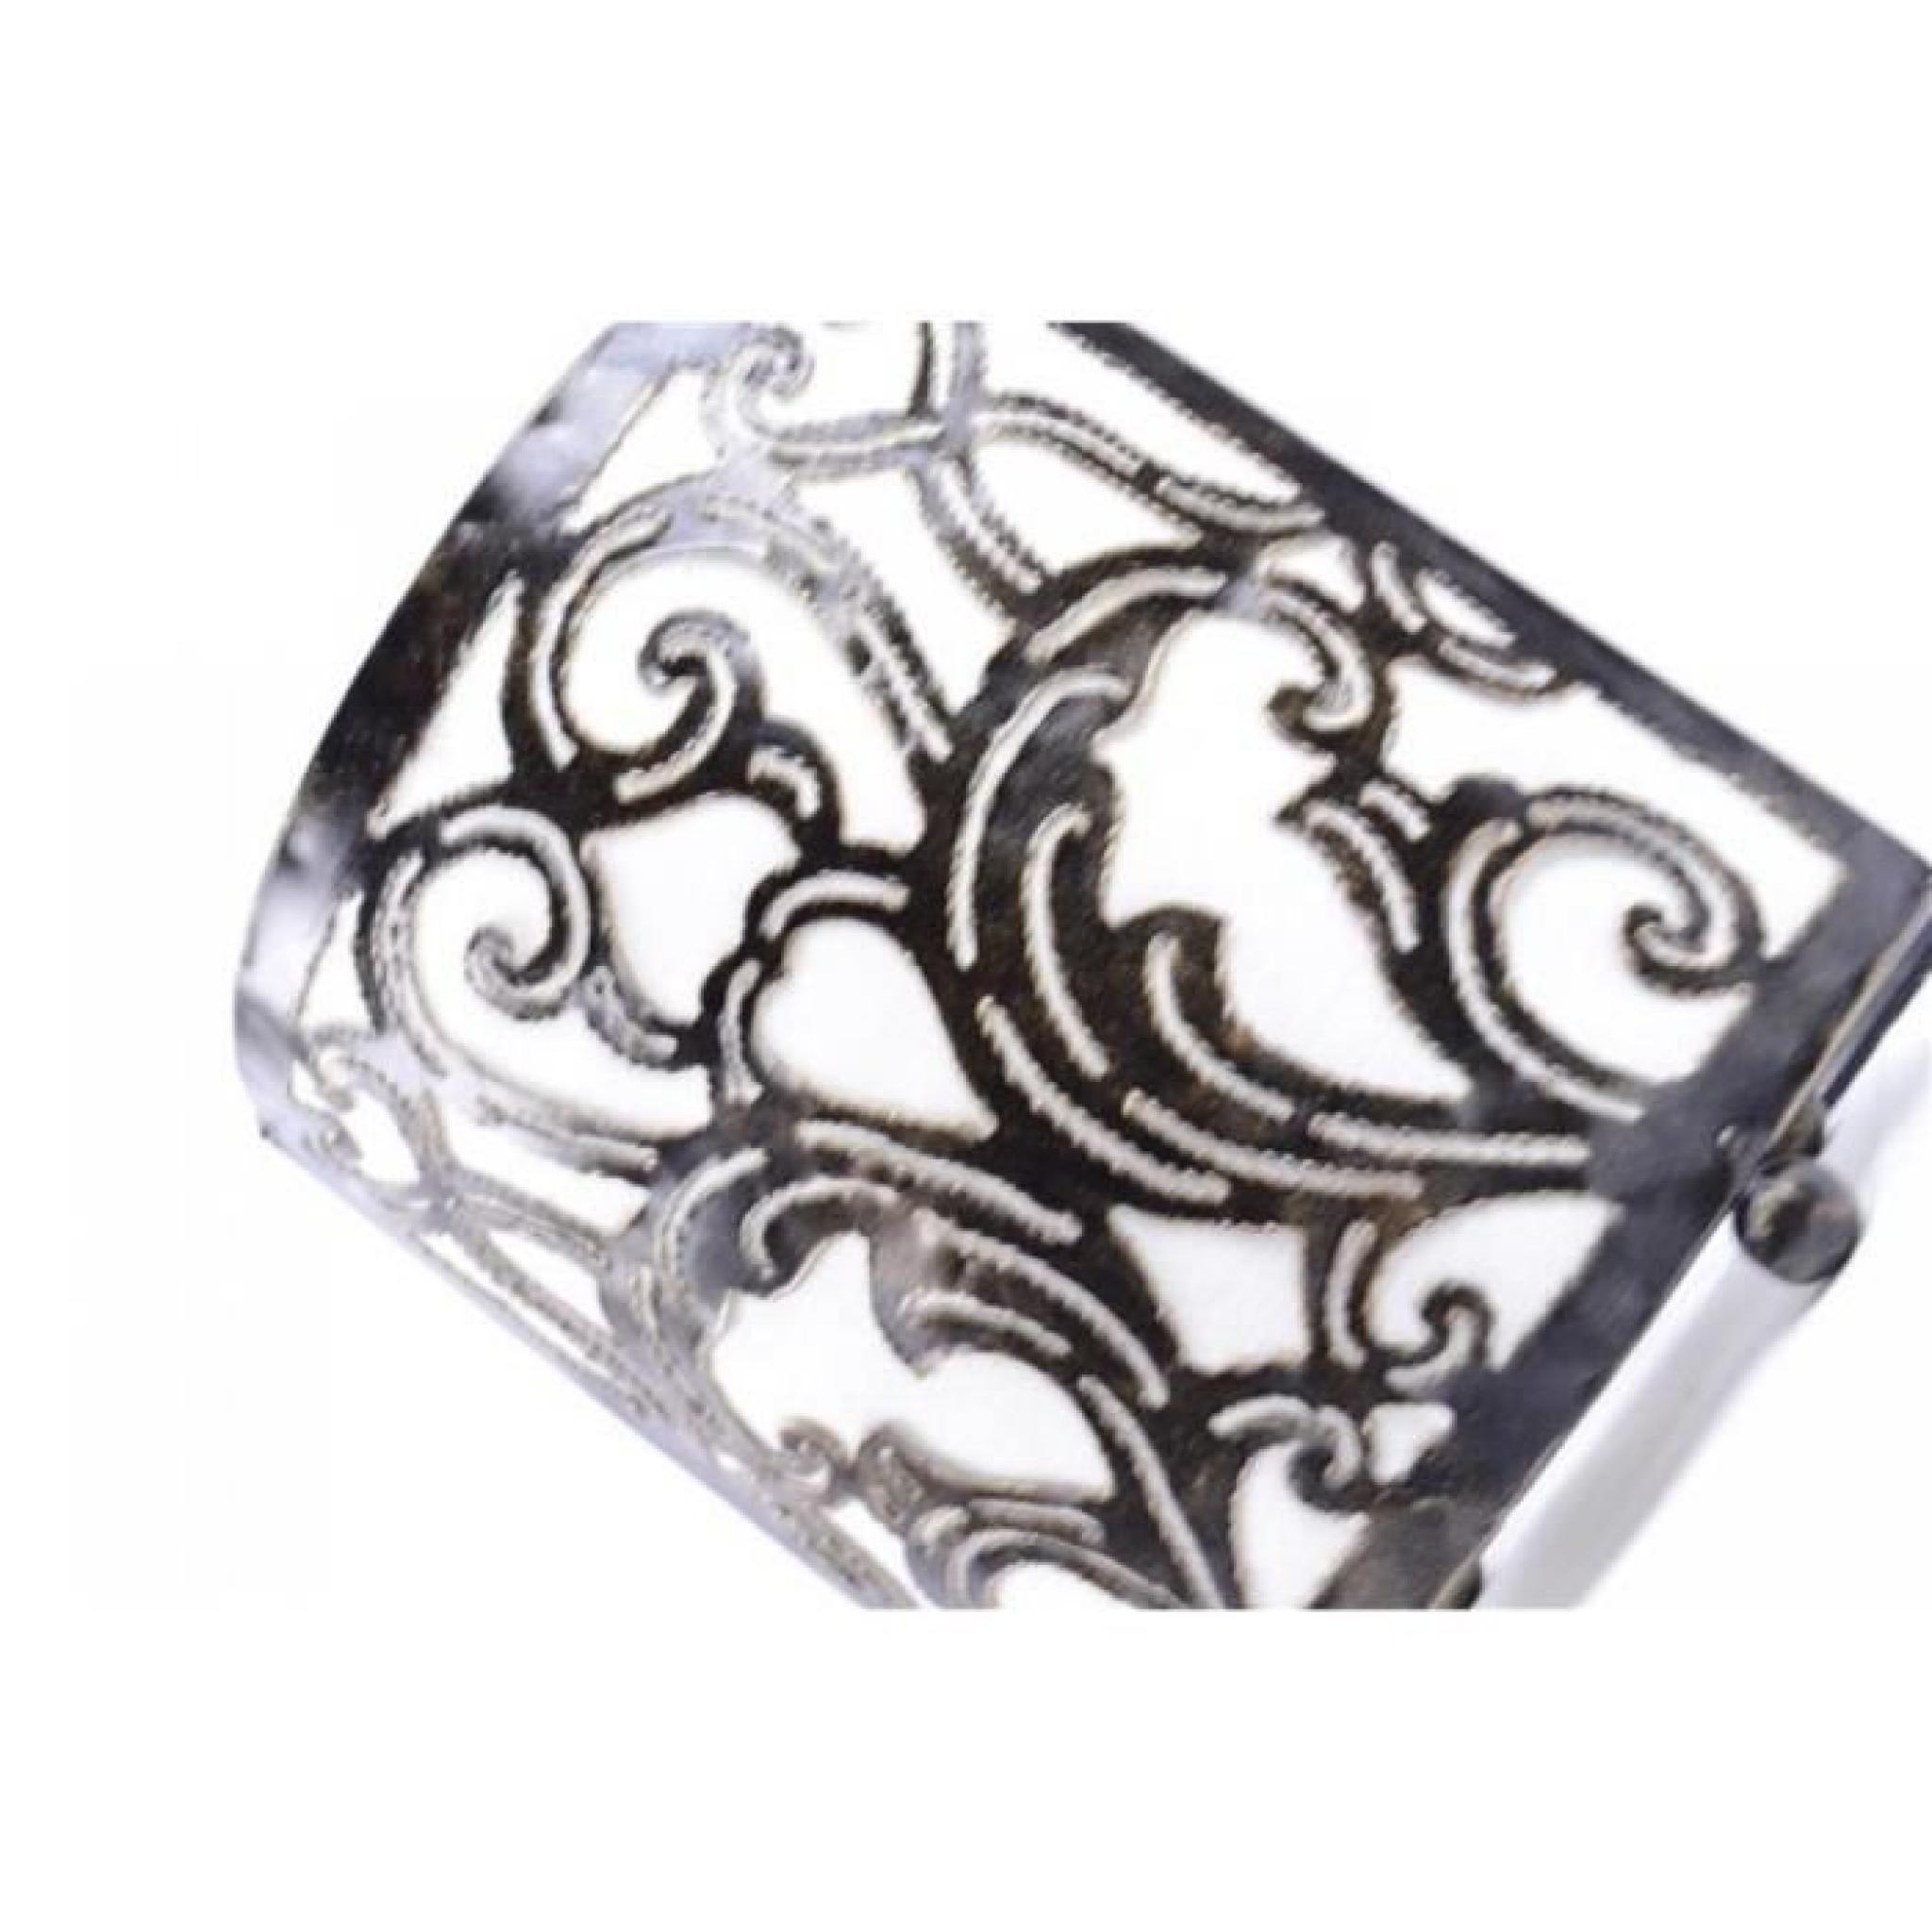 lampe de chevet style marocain oriental fer forg tissu blanc achat vente lampe a poser pas. Black Bedroom Furniture Sets. Home Design Ideas